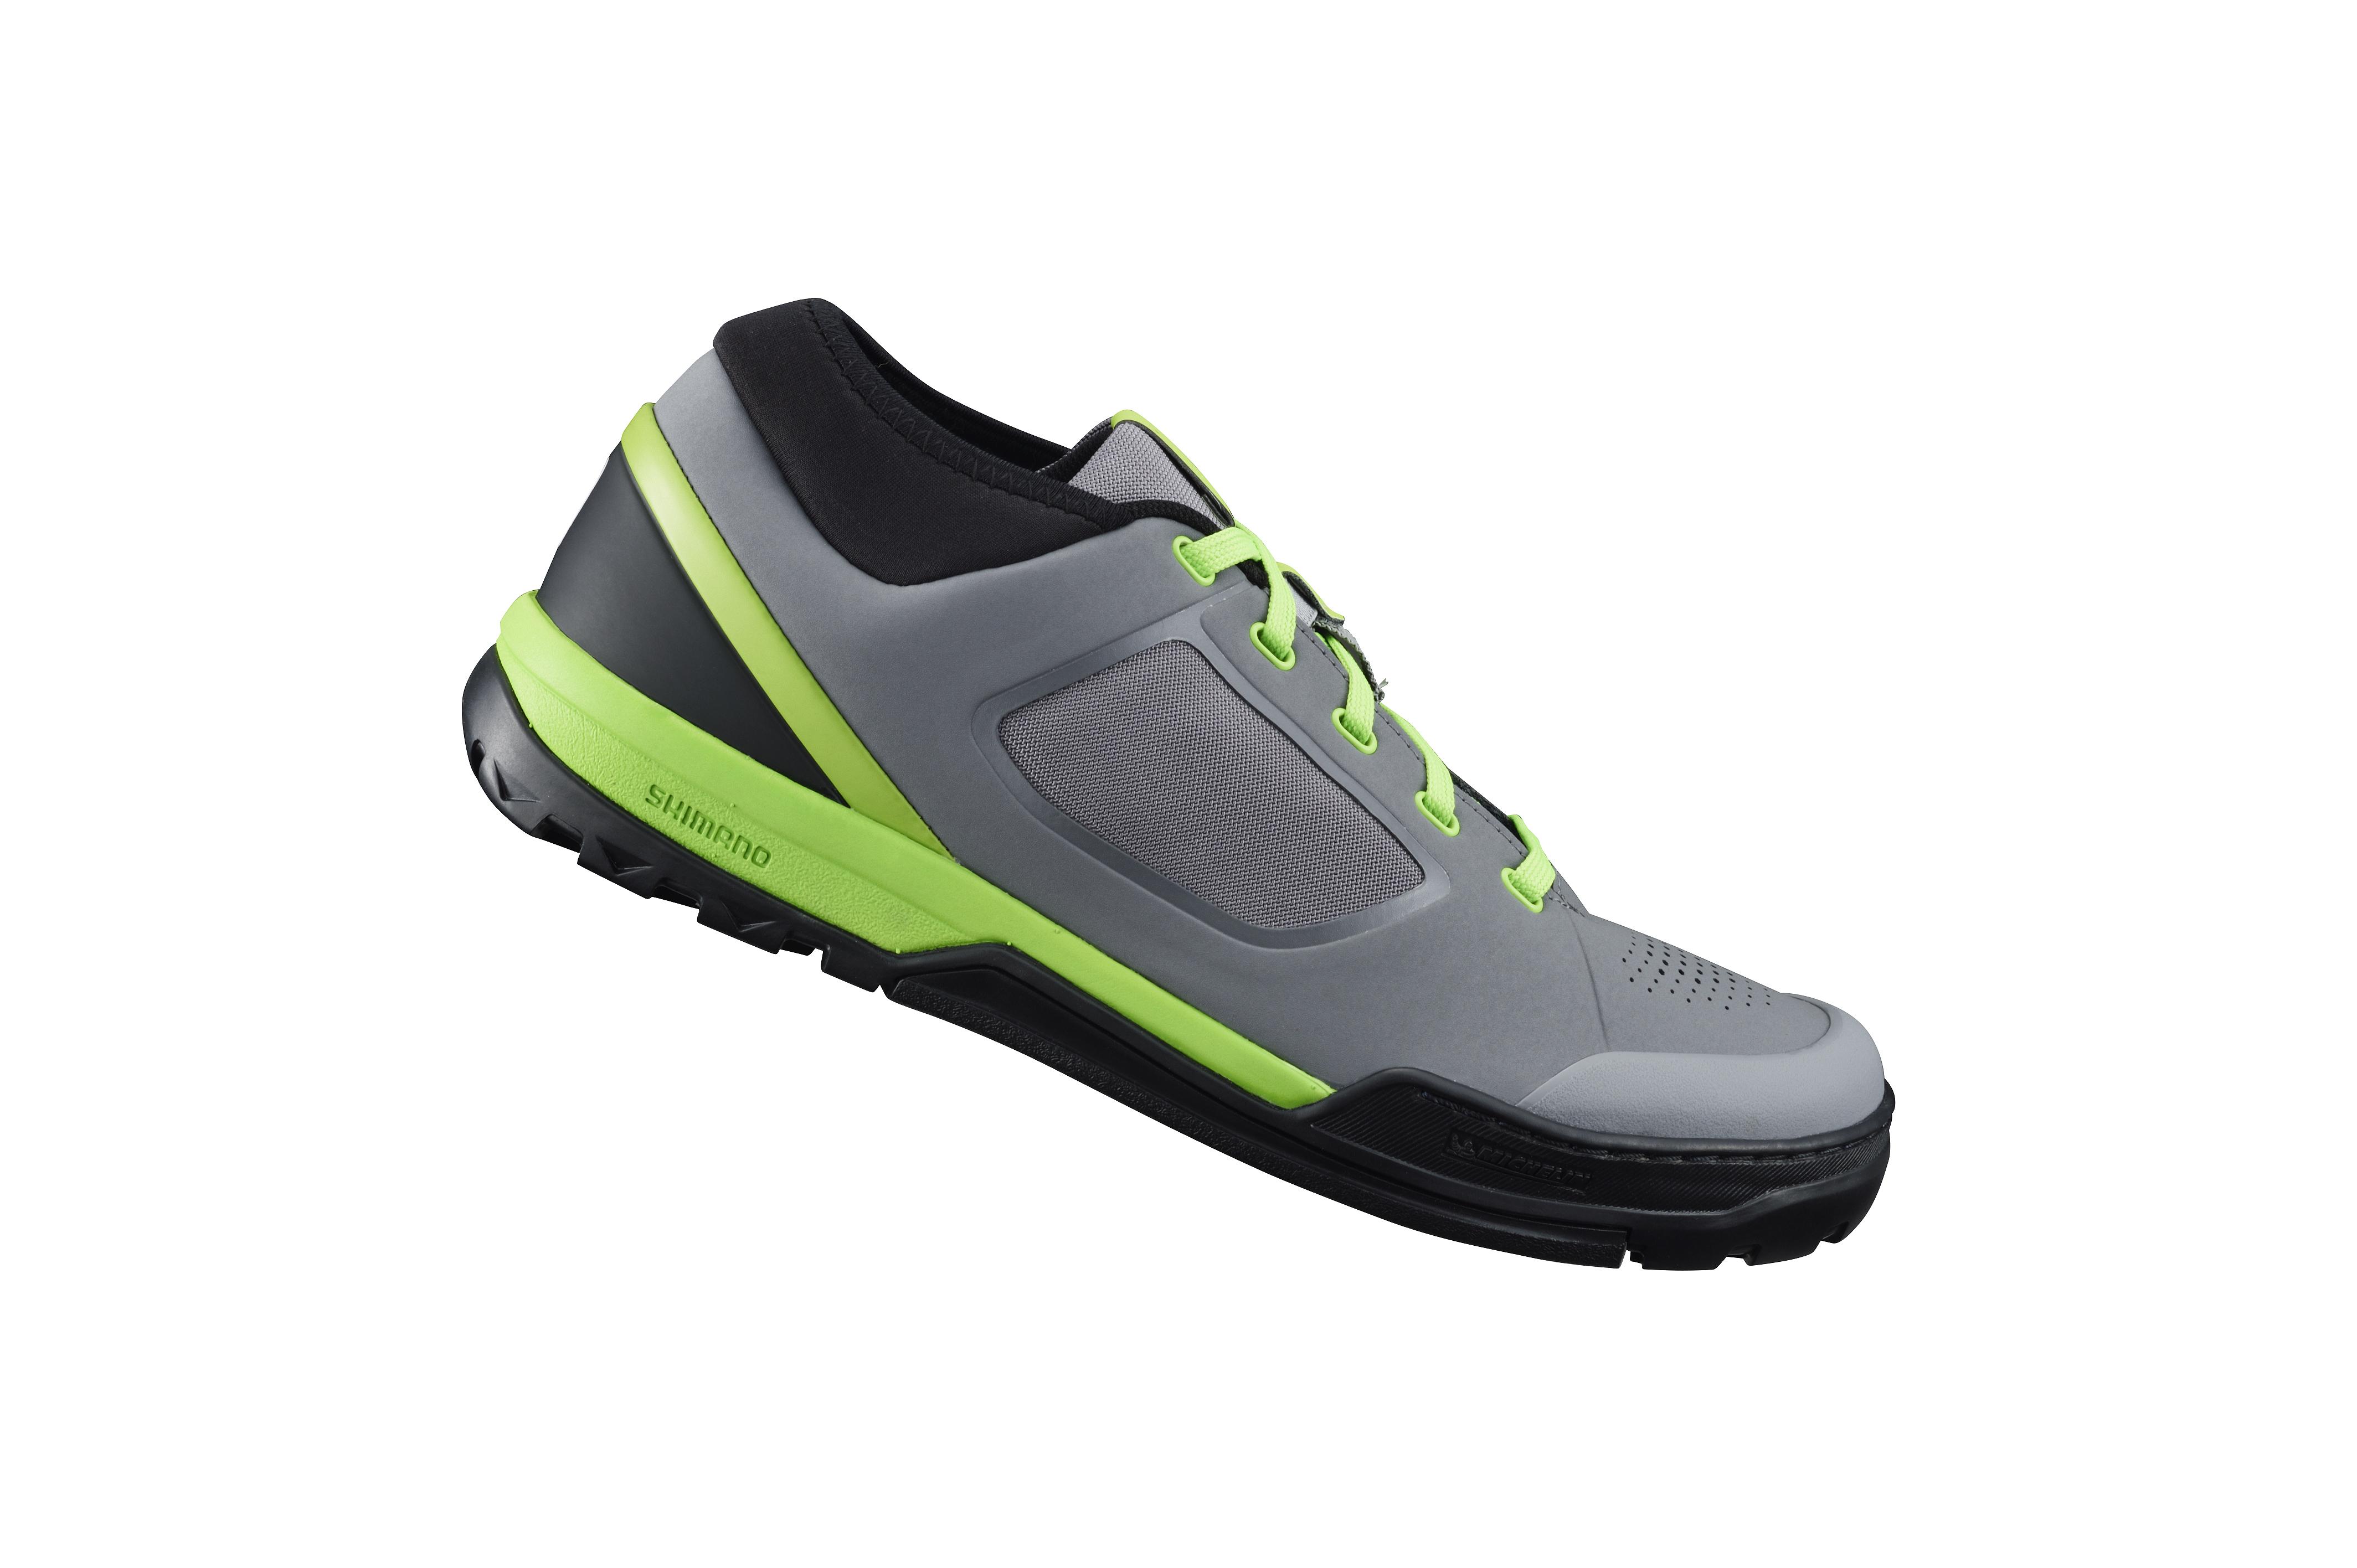 Shimano MTB obuv SH-GR700MR, šedá zelená, 44